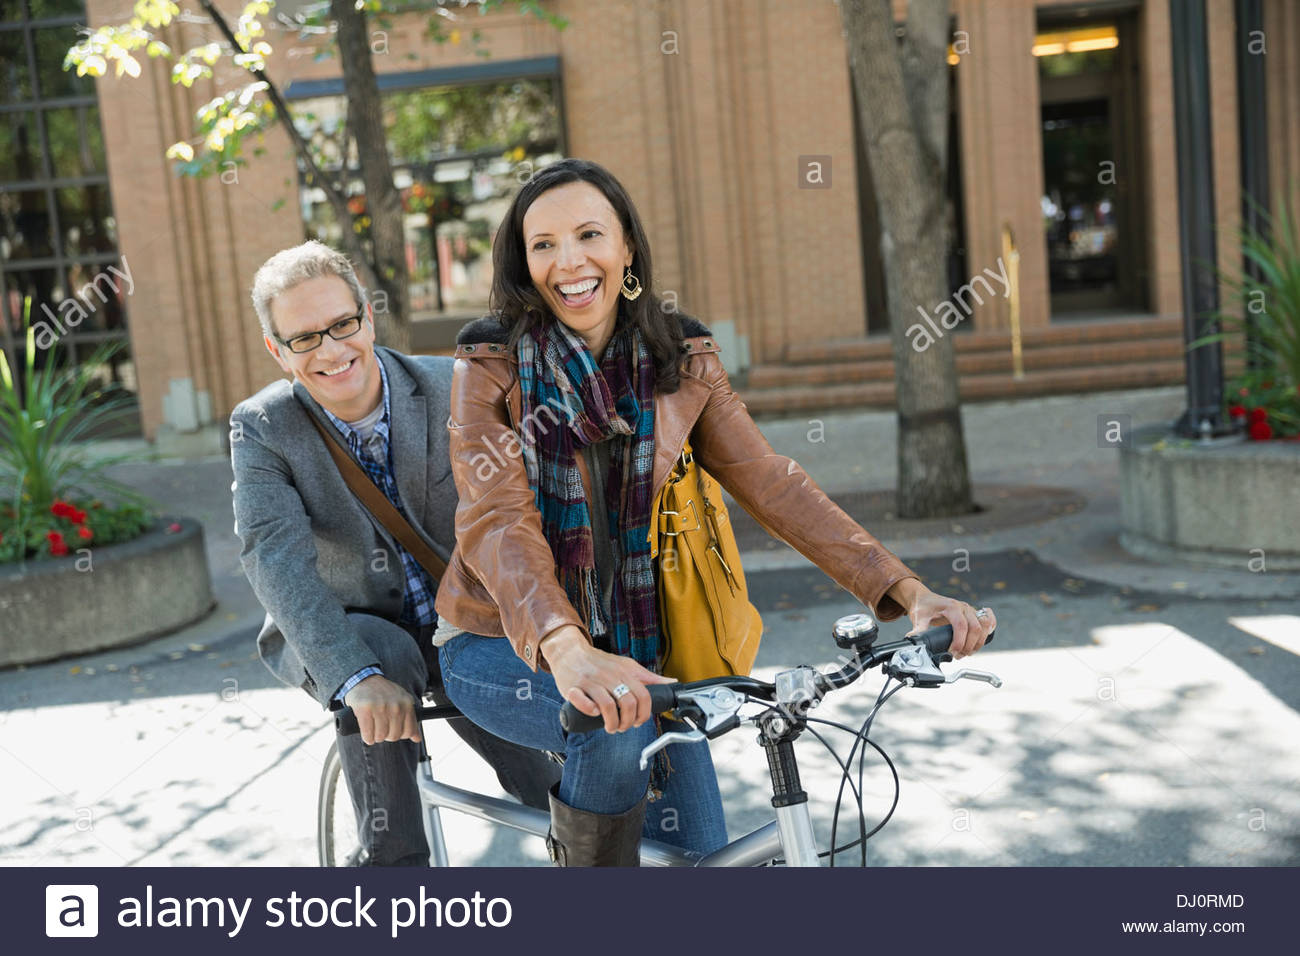 Smiling couple riding tandem Photo Stock